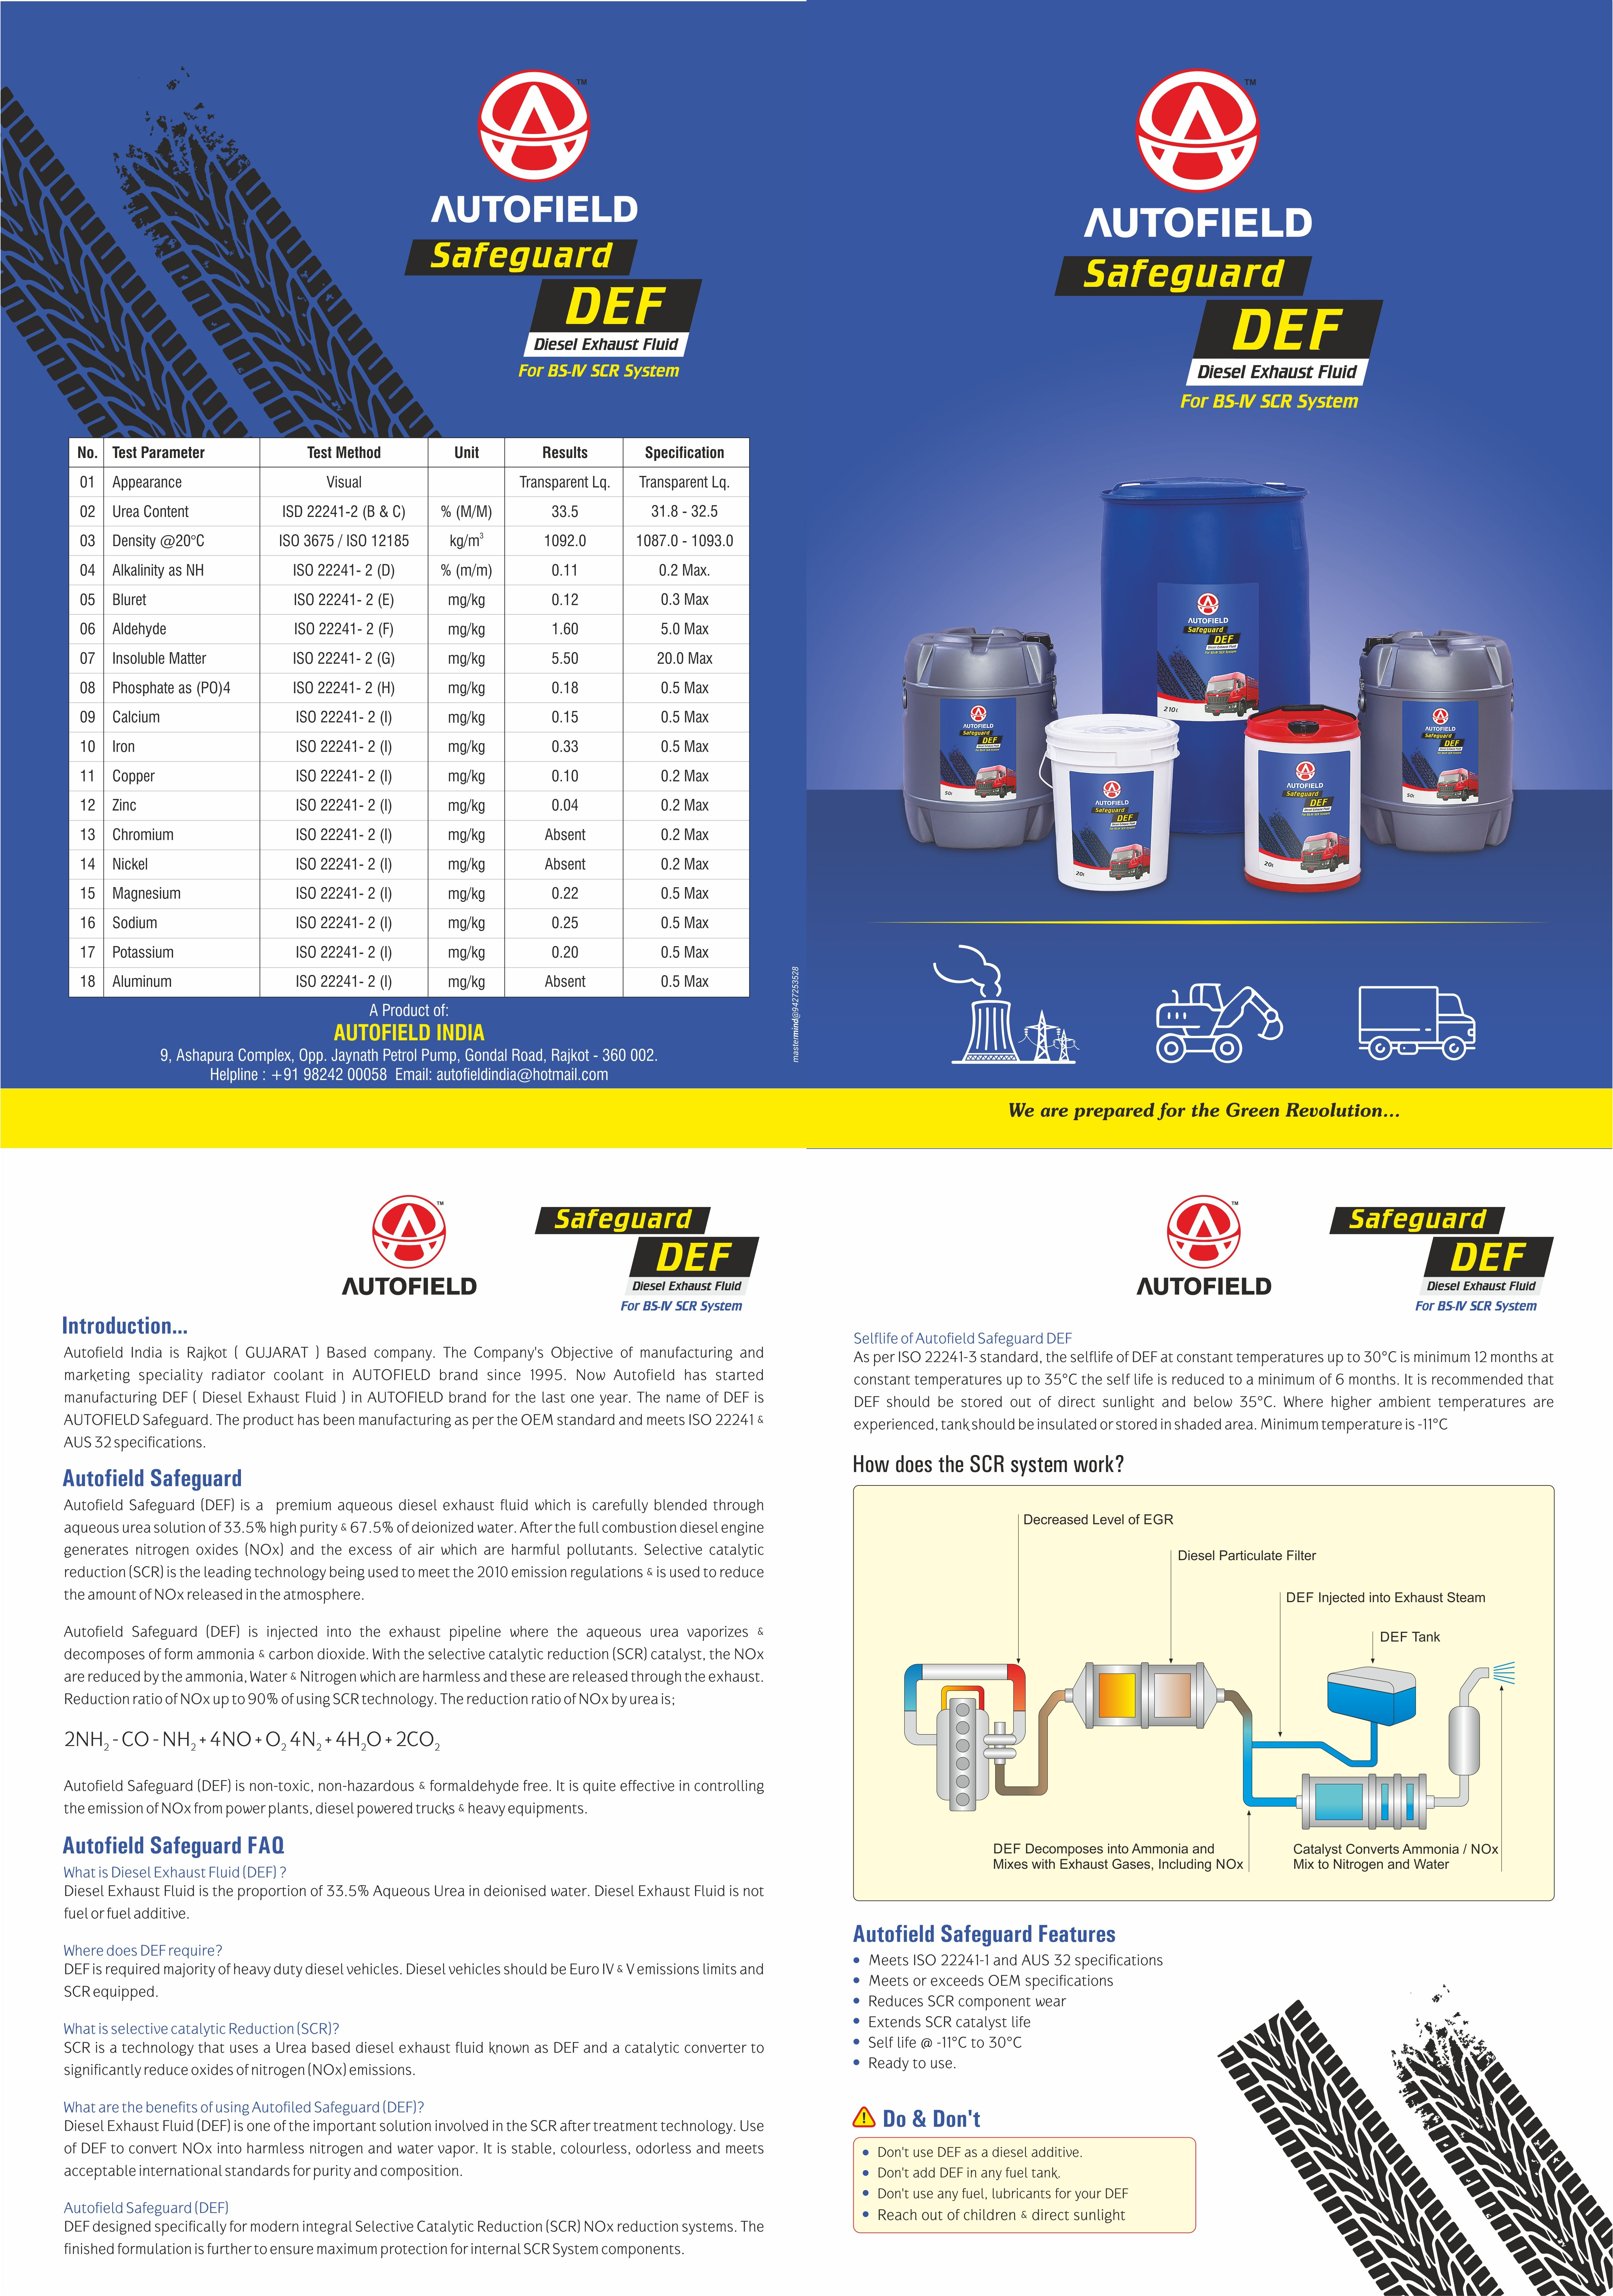 Autofield DEF Brochure Design